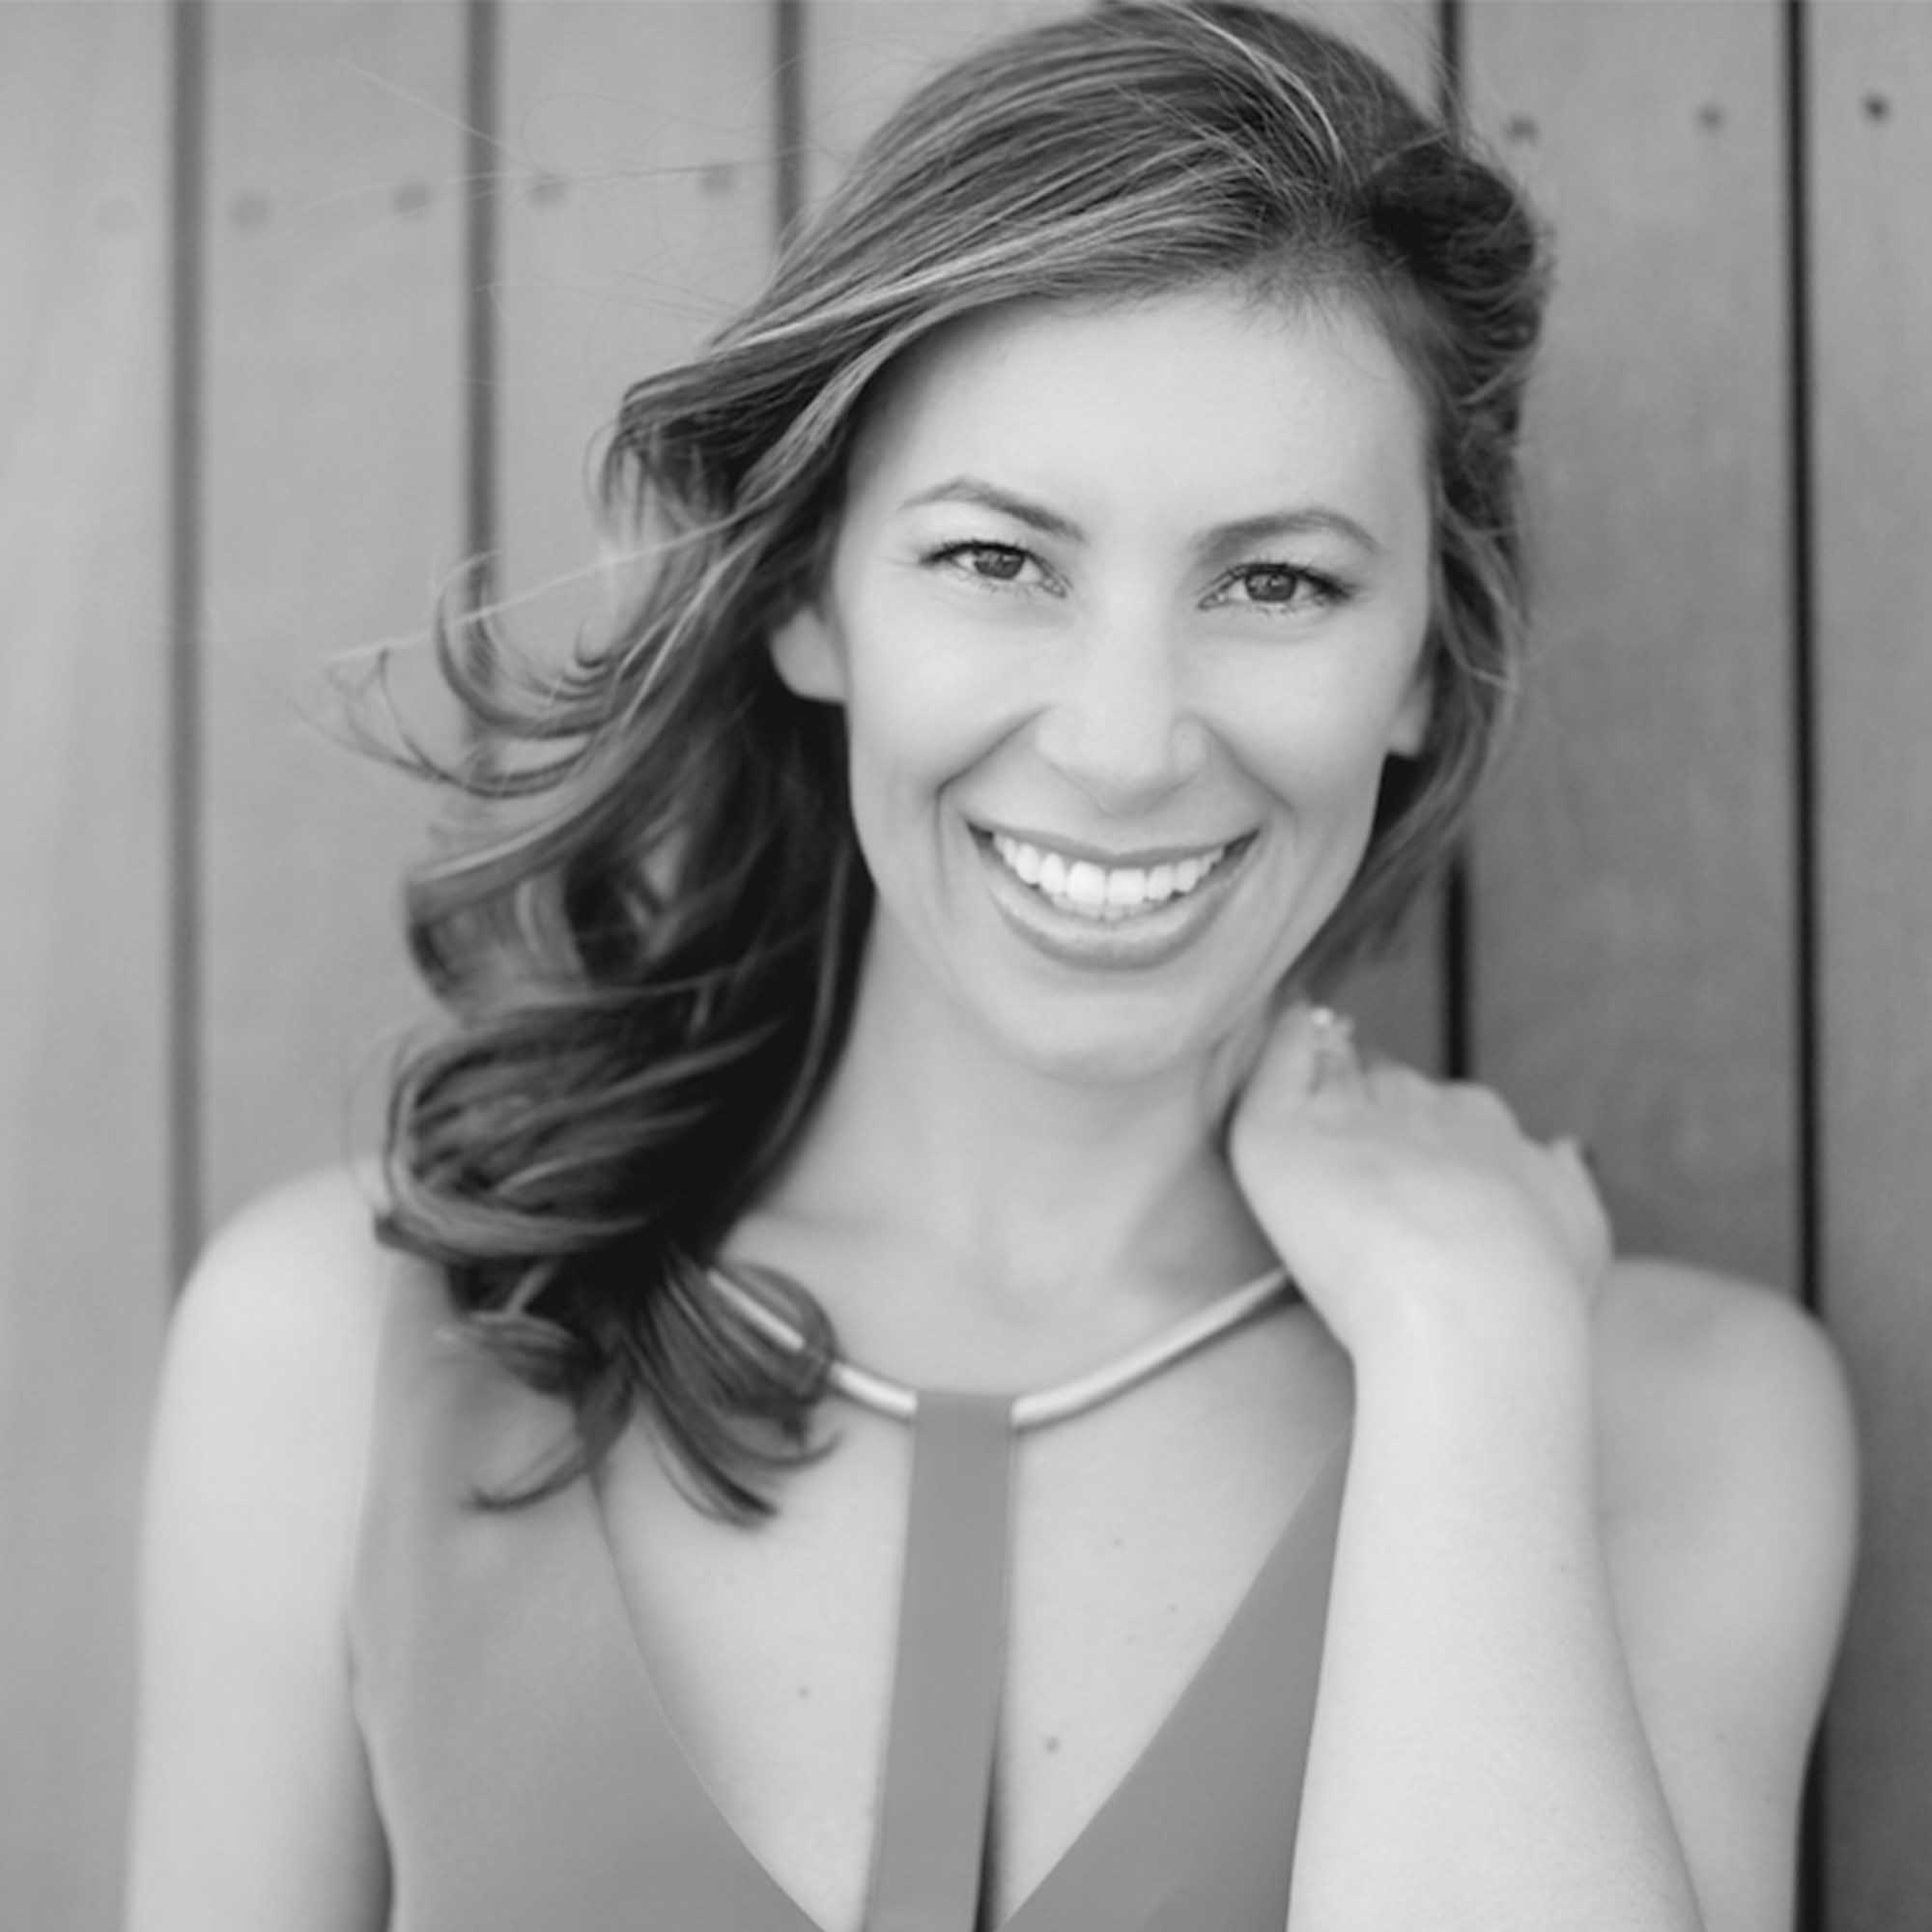 Talia Goldstein - Founder of Three Day Rule